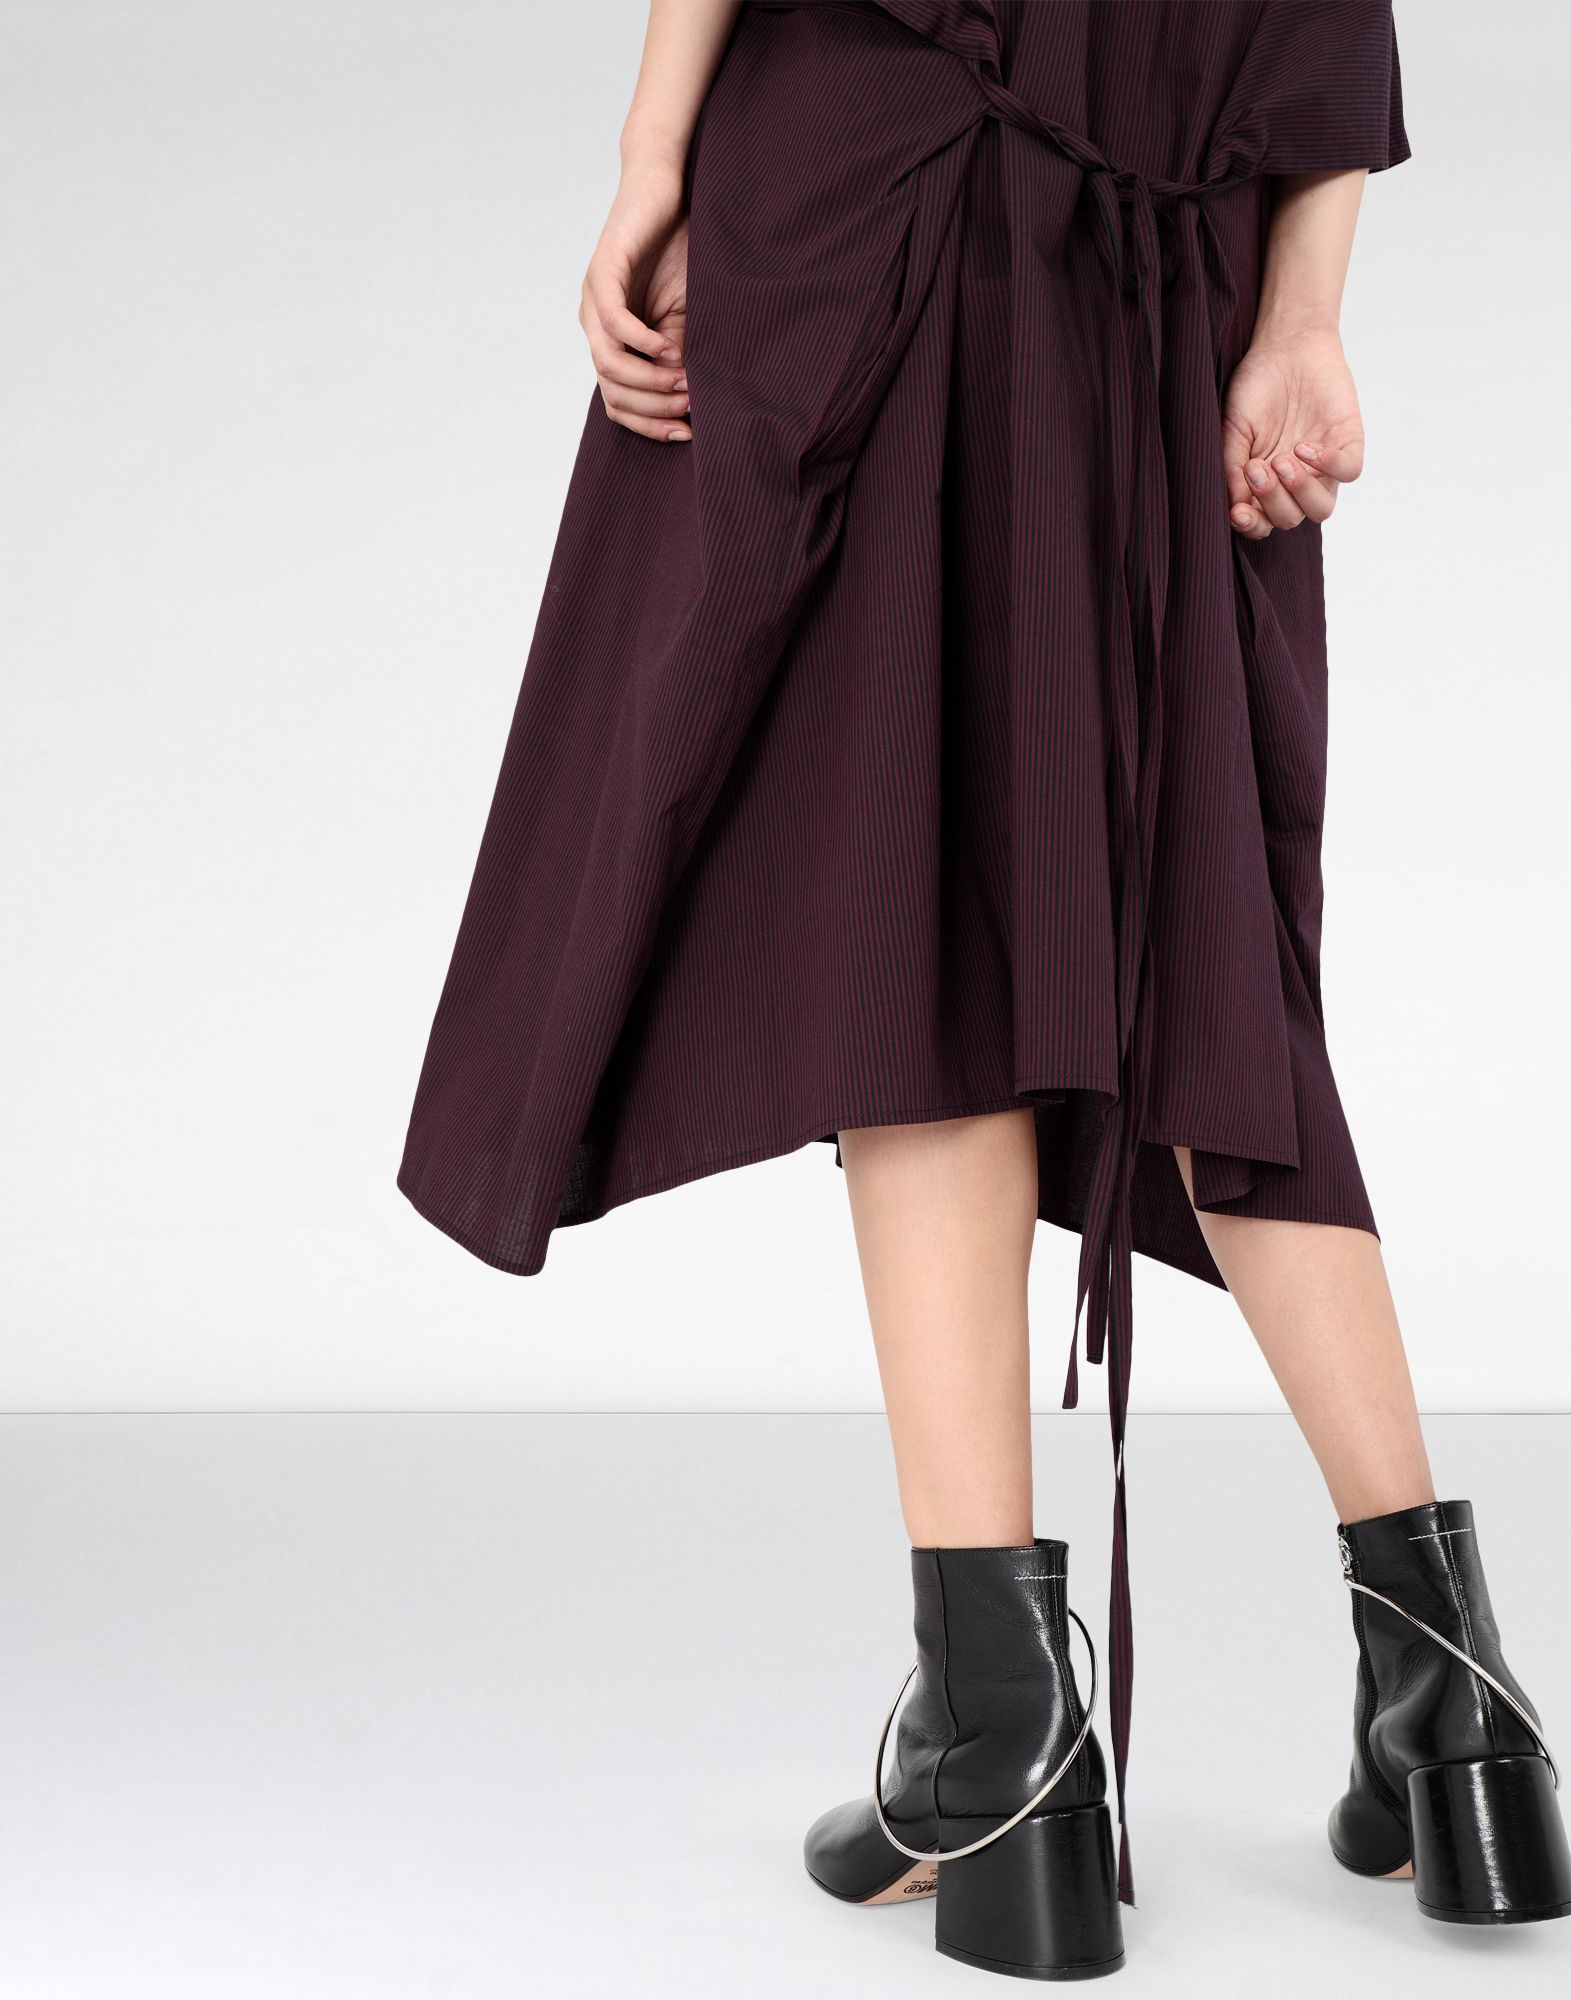 MM6 MAISON MARGIELA Flat cotton dress 3/4 length dress Woman a